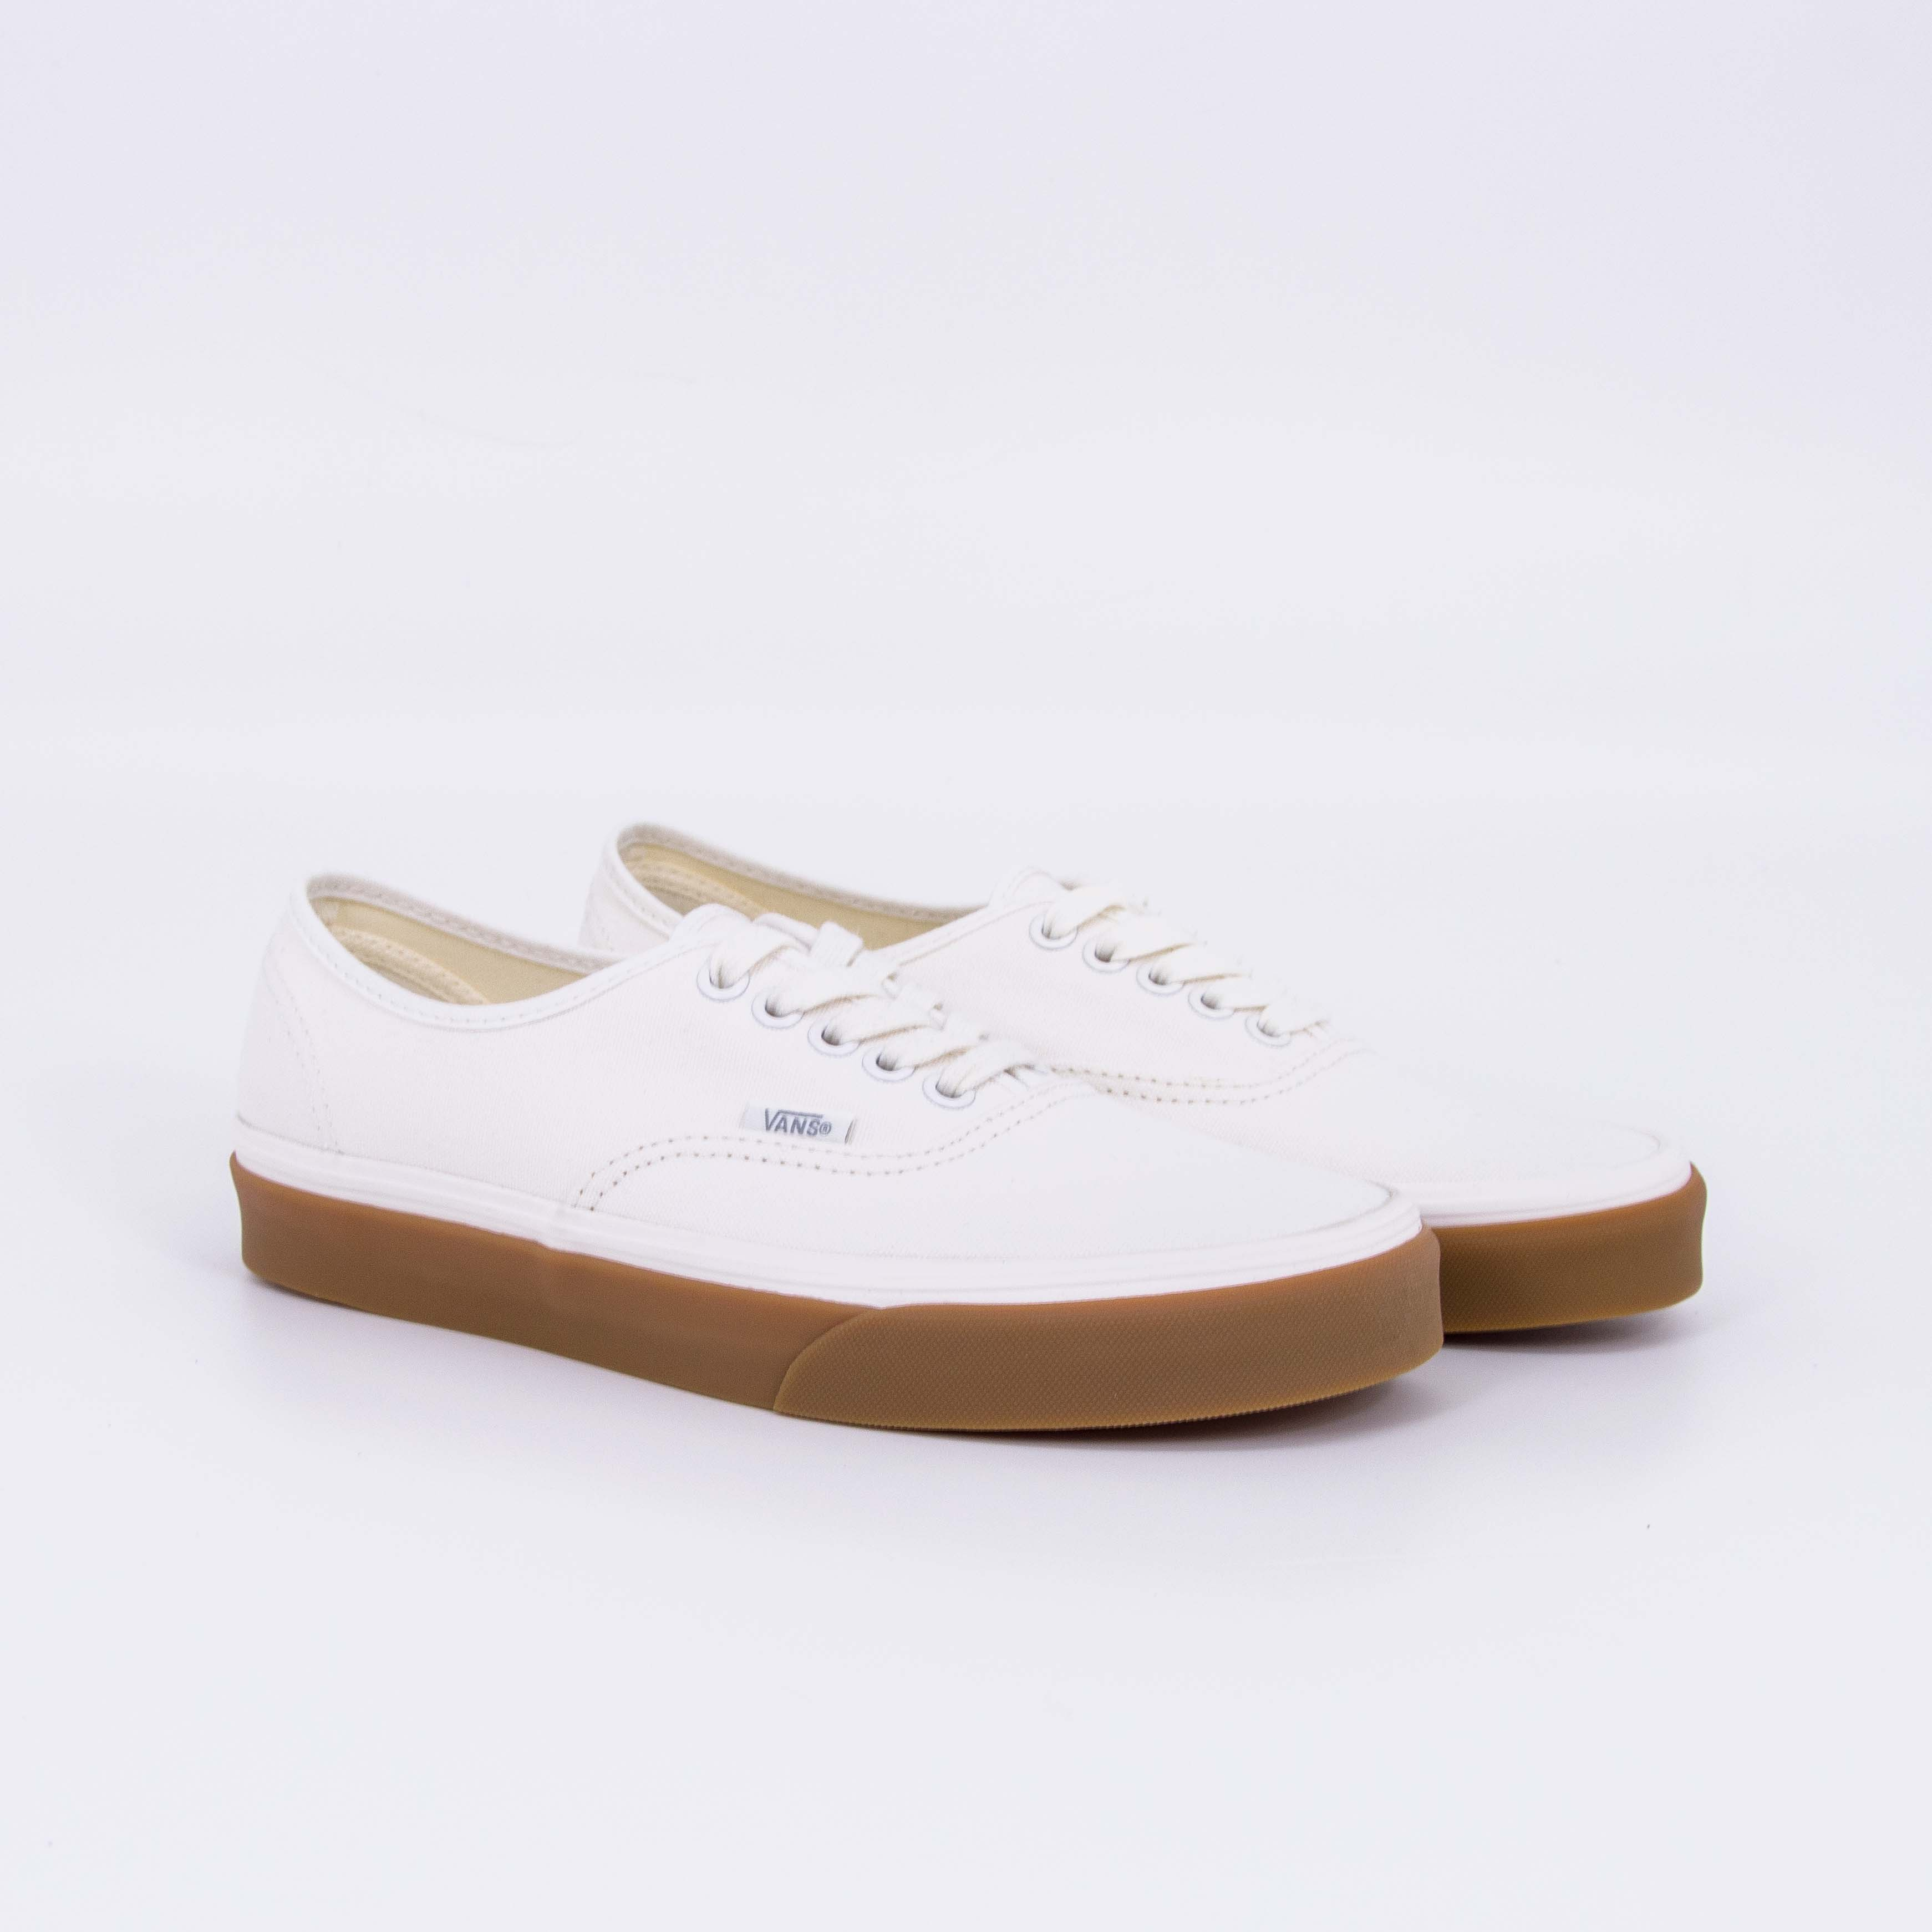 Vans - AUTHENTIC - Marshmallow/Gum